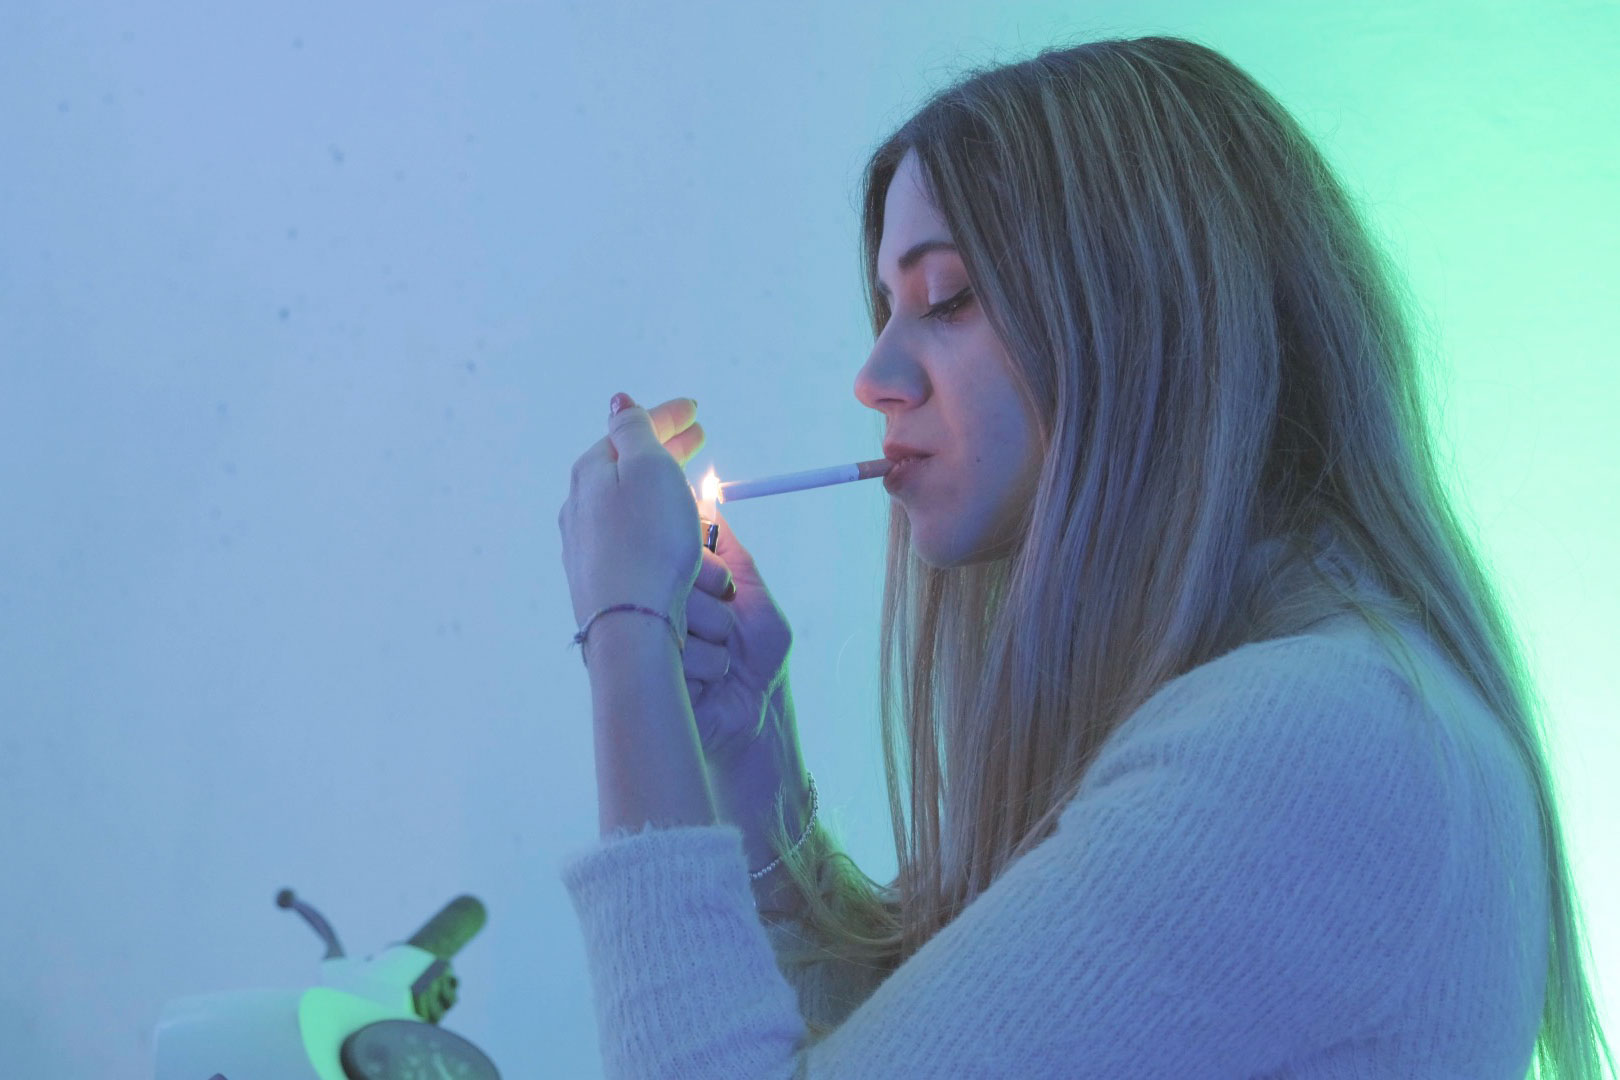 ragazza fuma sigaretta